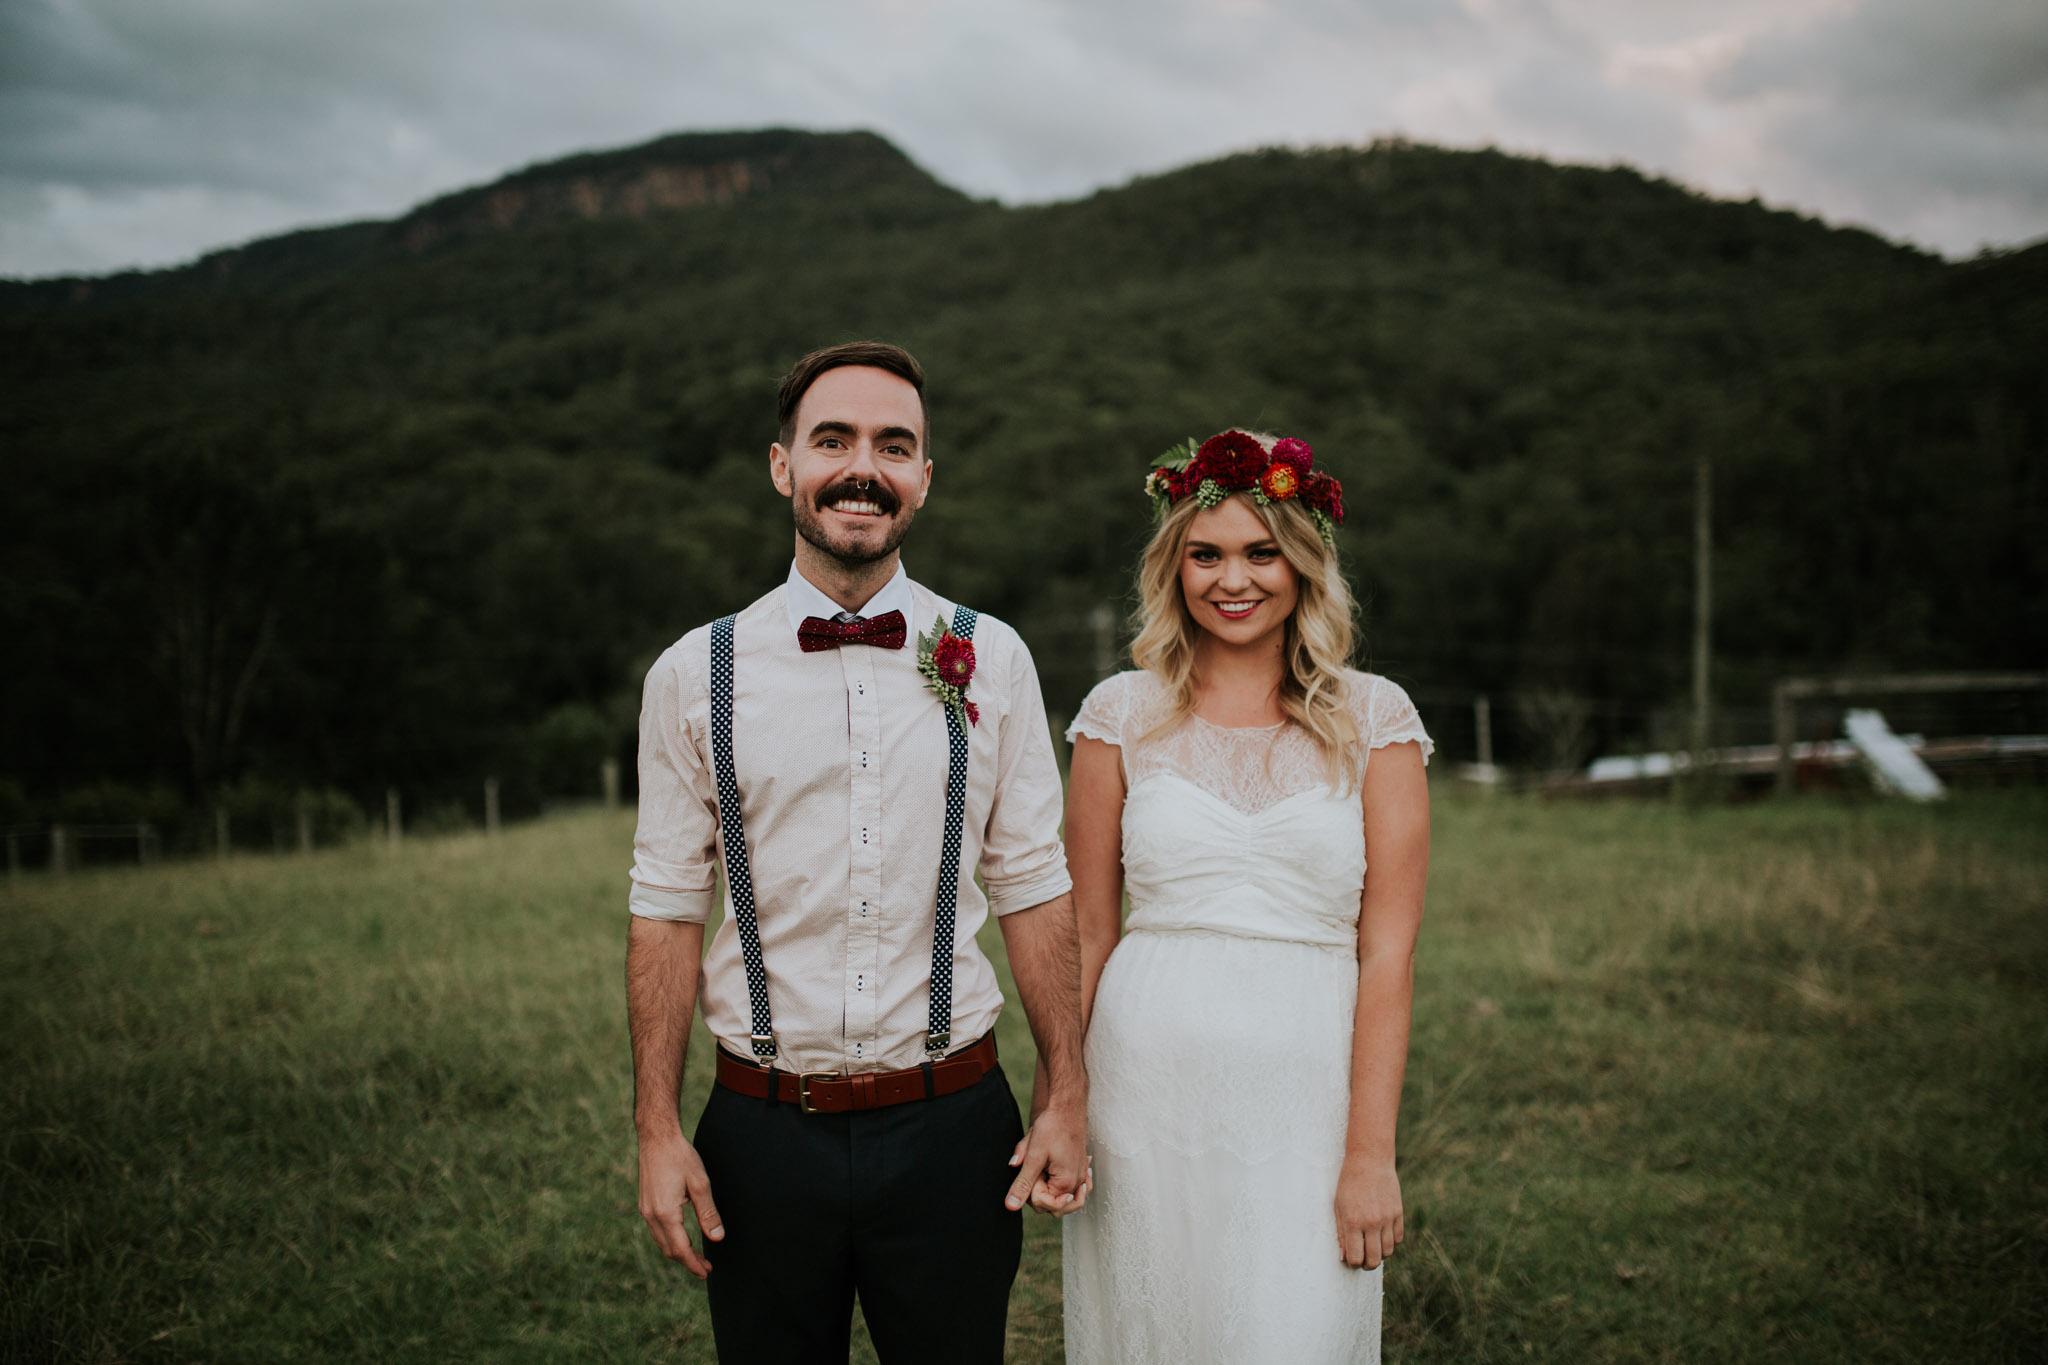 SPRING-GROVE-DAIRY-WEDDING-177.jpg